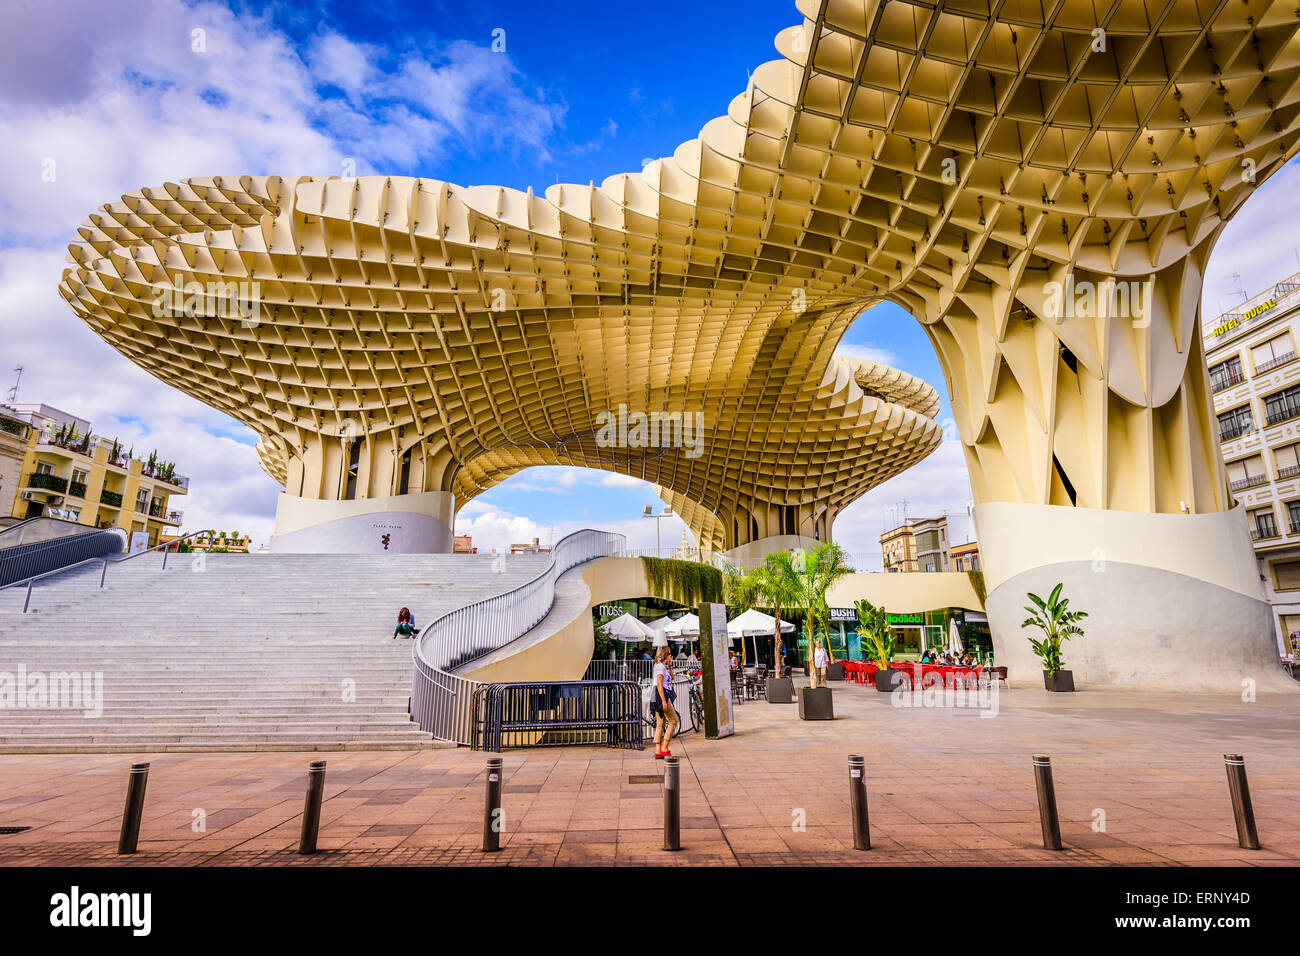 The Metropol Parasol walkway in Seville, Spain. - Stock Image